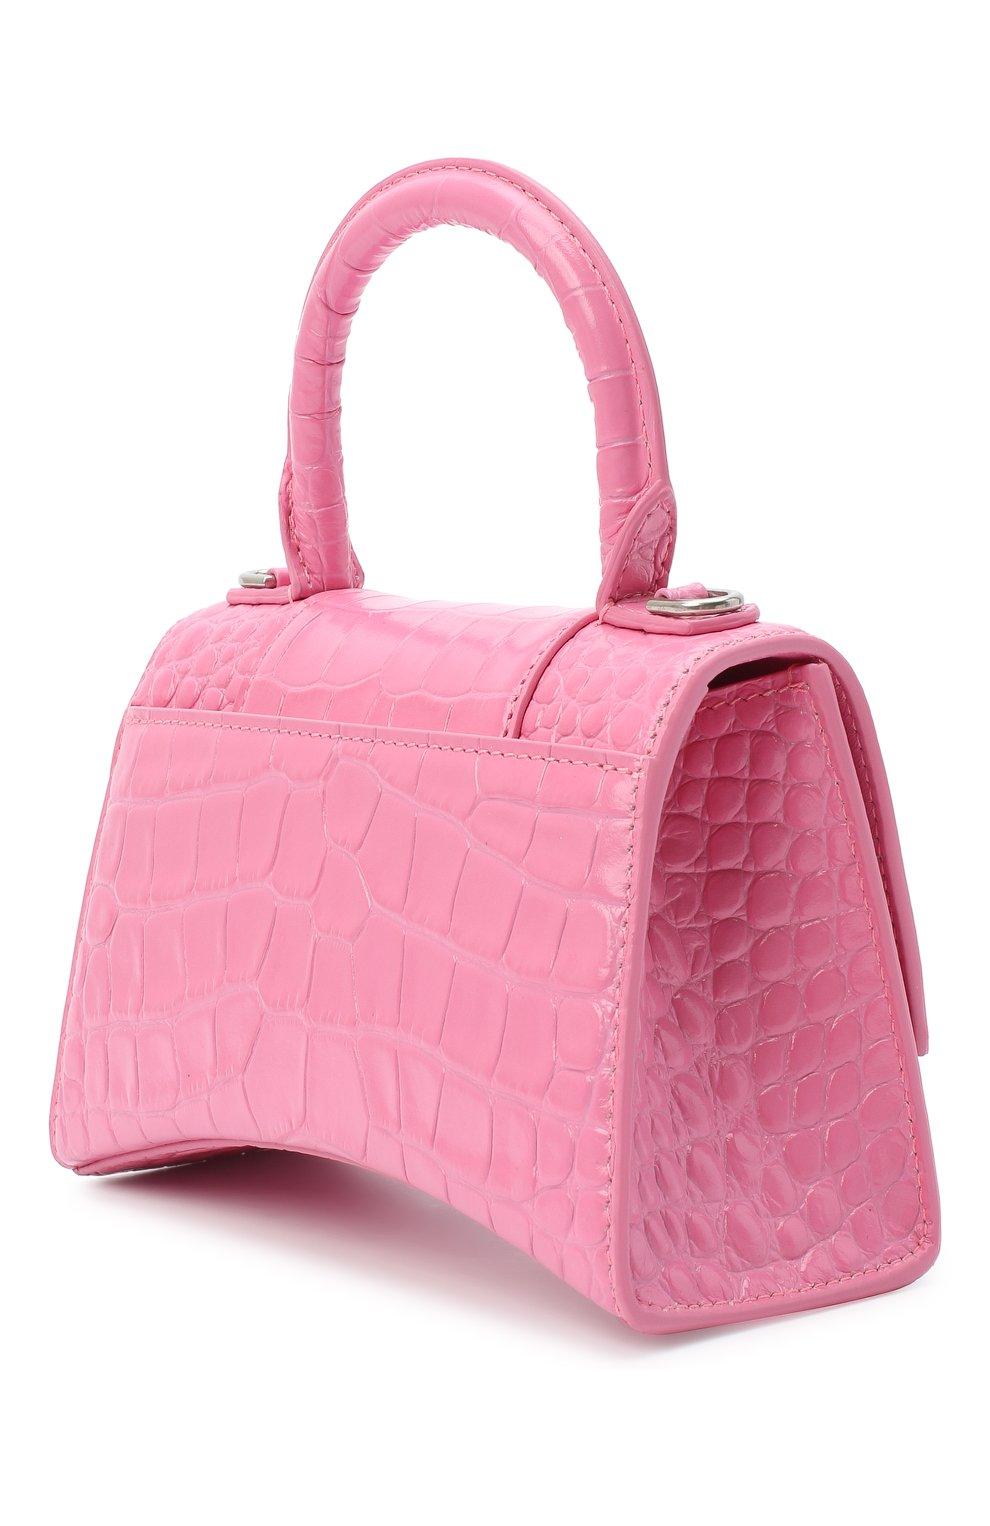 Женская сумка hourglass xs BALENCIAGA розового цвета, арт. 592833/1LR6Y   Фото 3 (Сумки-технические: Сумки через плечо, Сумки top-handle; Материал: Натуральная кожа; Размер: mini; Ремень/цепочка: На ремешке)